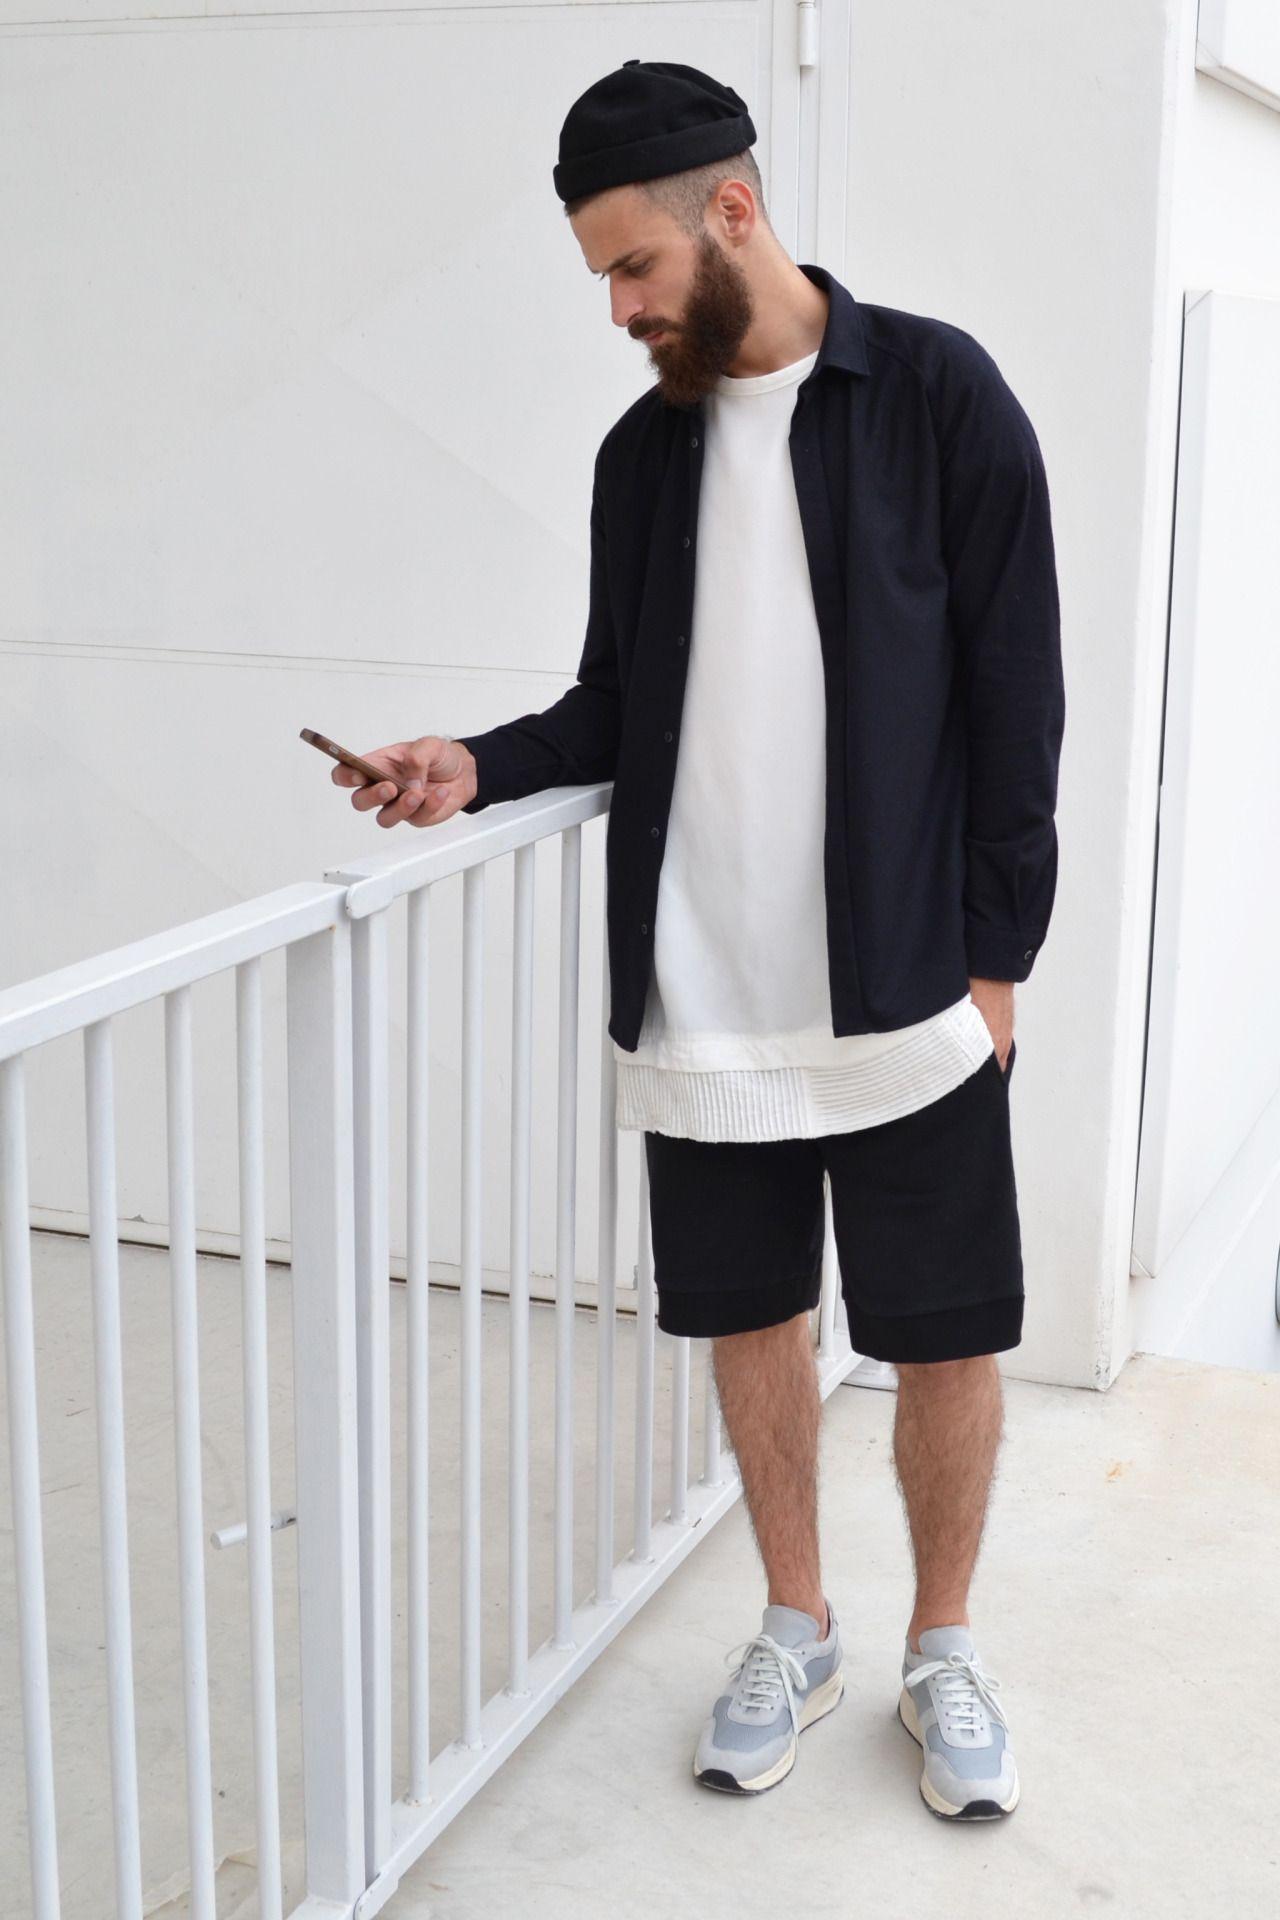 Alkarus com em 2019 | Look masculinos, Moda masculina dicas